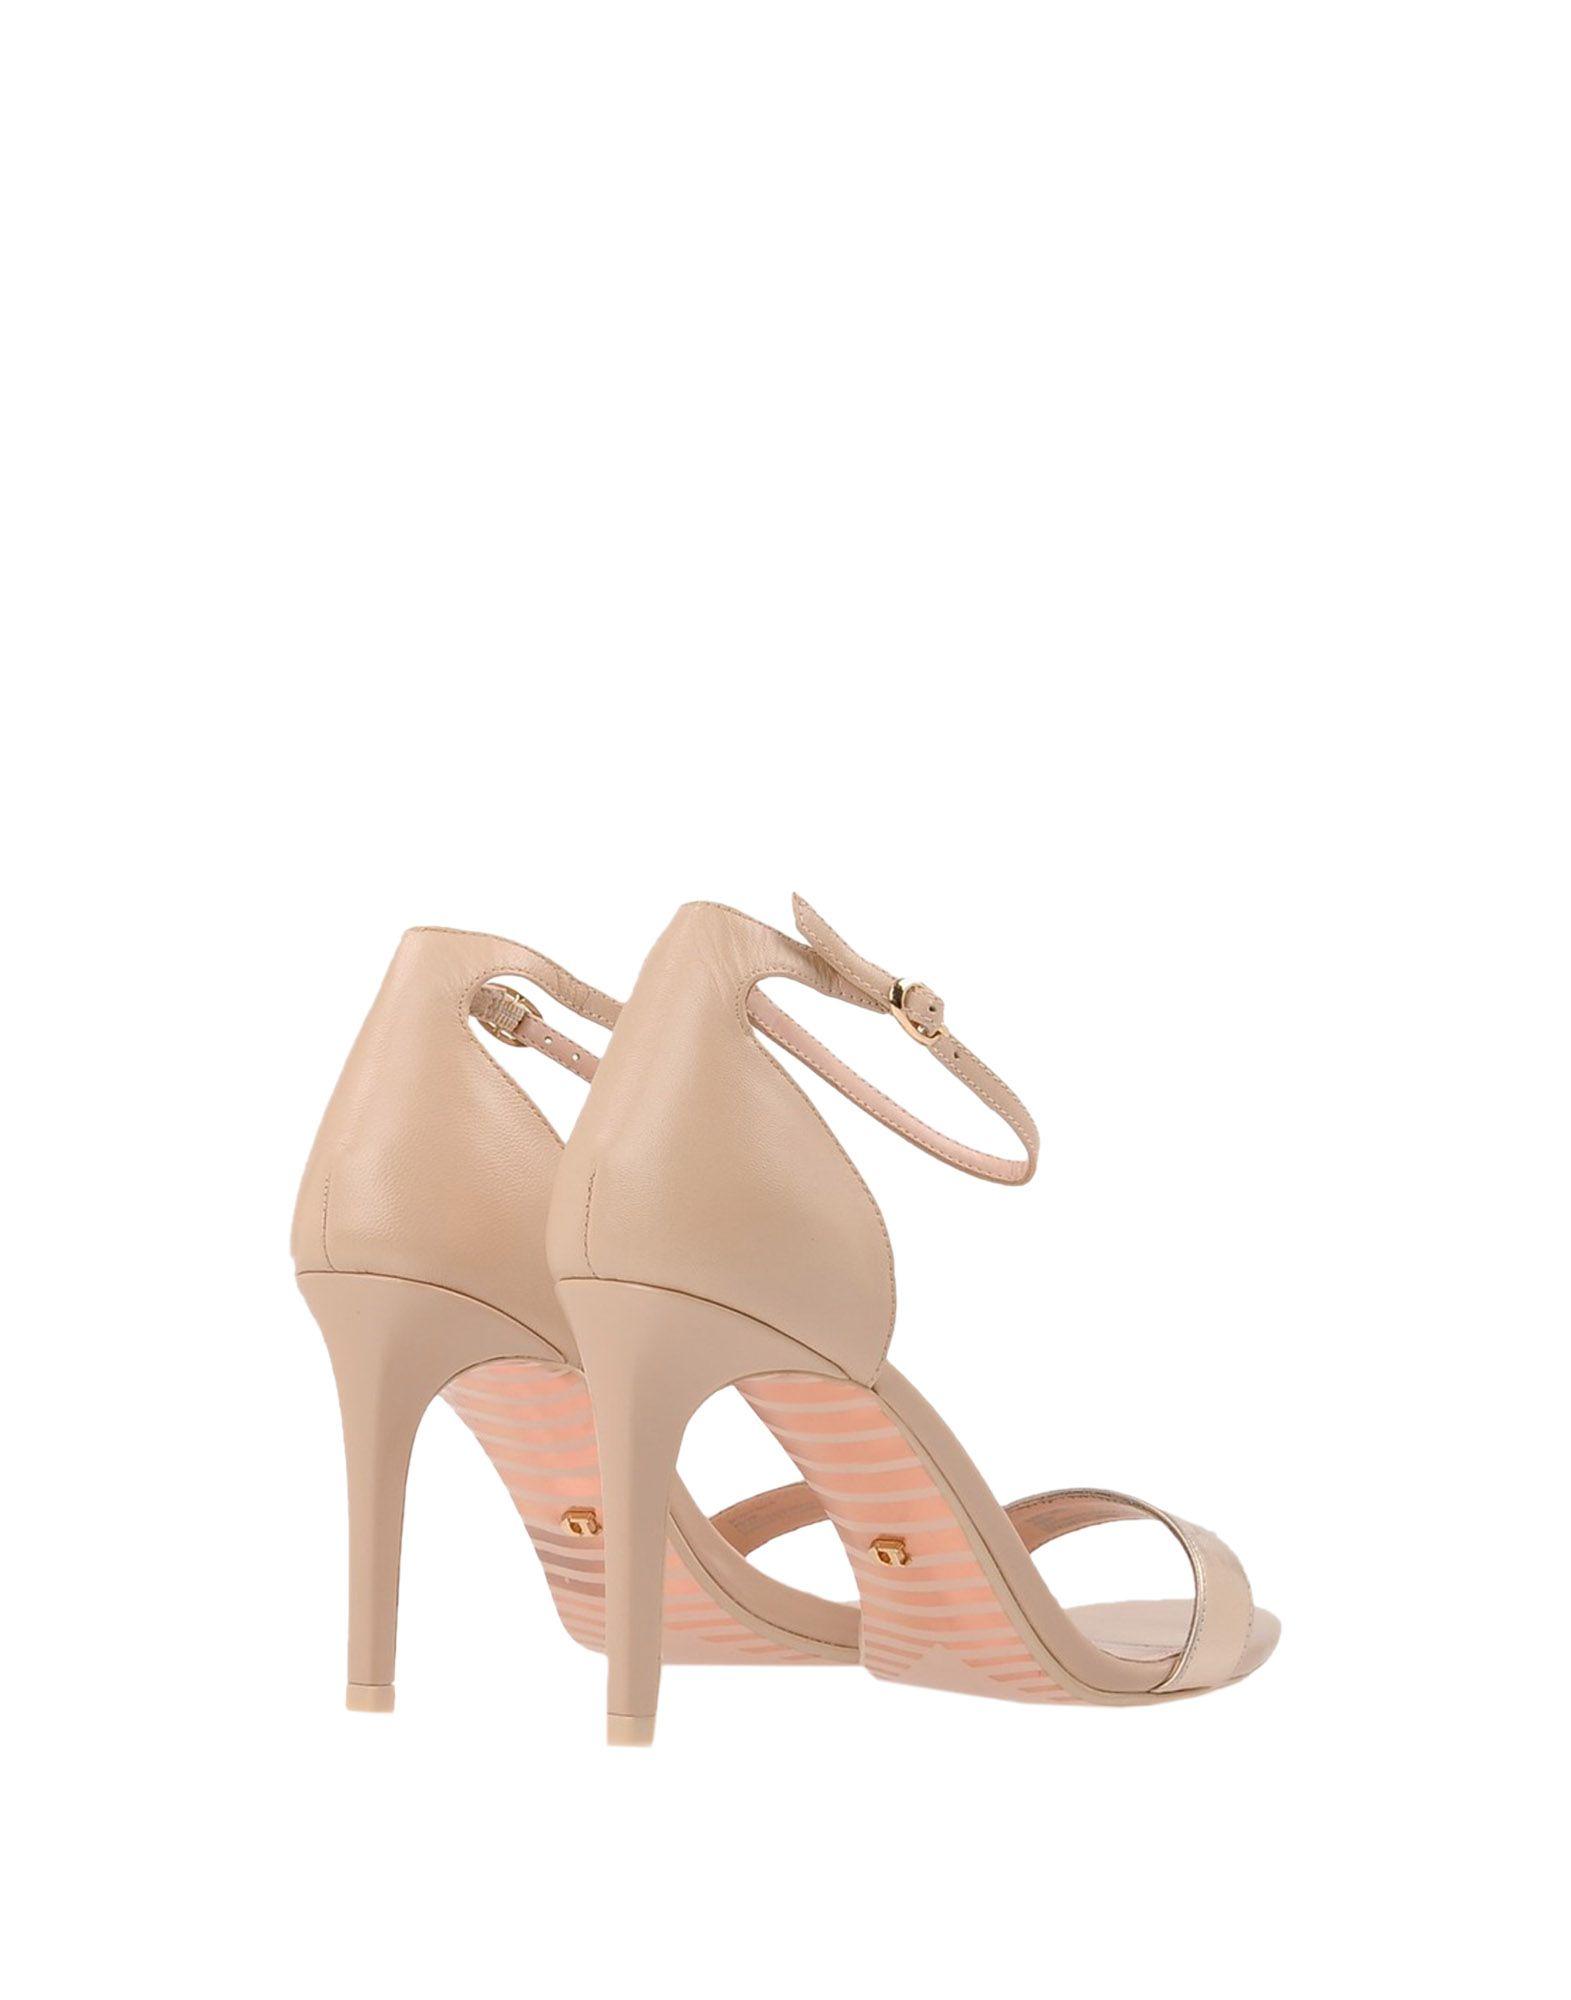 Dune London 2 Part Sandal  11441922BC Gute Qualität beliebte Schuhe